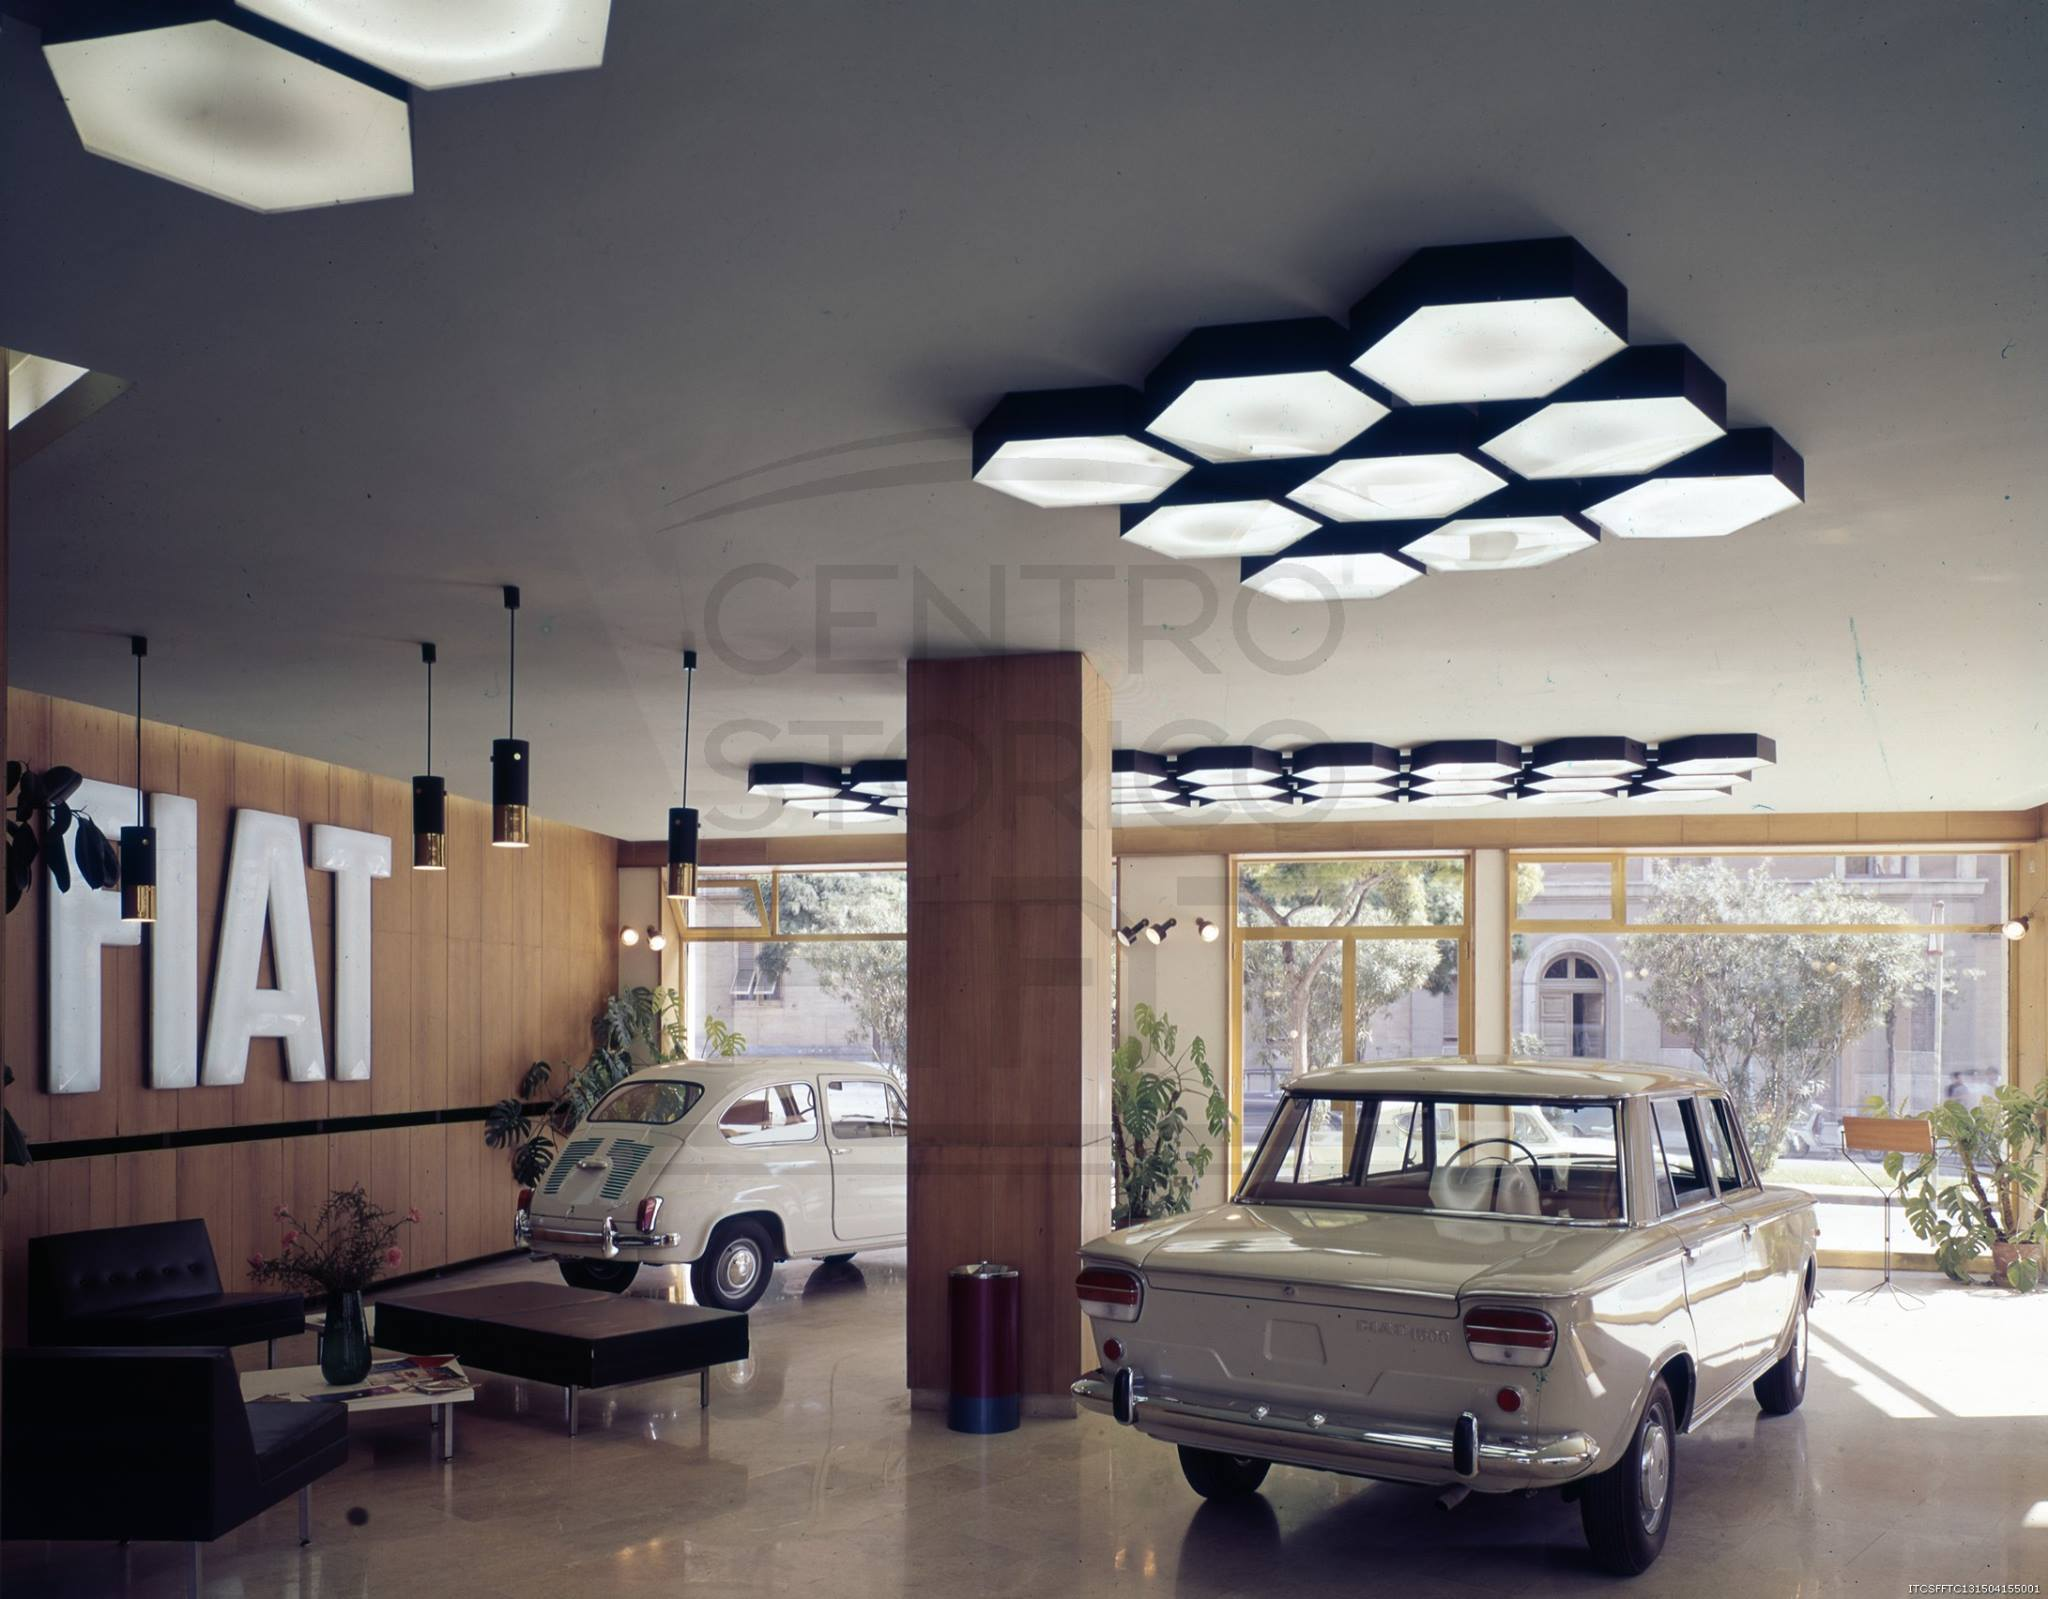 Fiat-600--fiat-1300-1500-1965-tentoonstelling-tentoonstelling-van-de-fiat-tak-van-cagliari